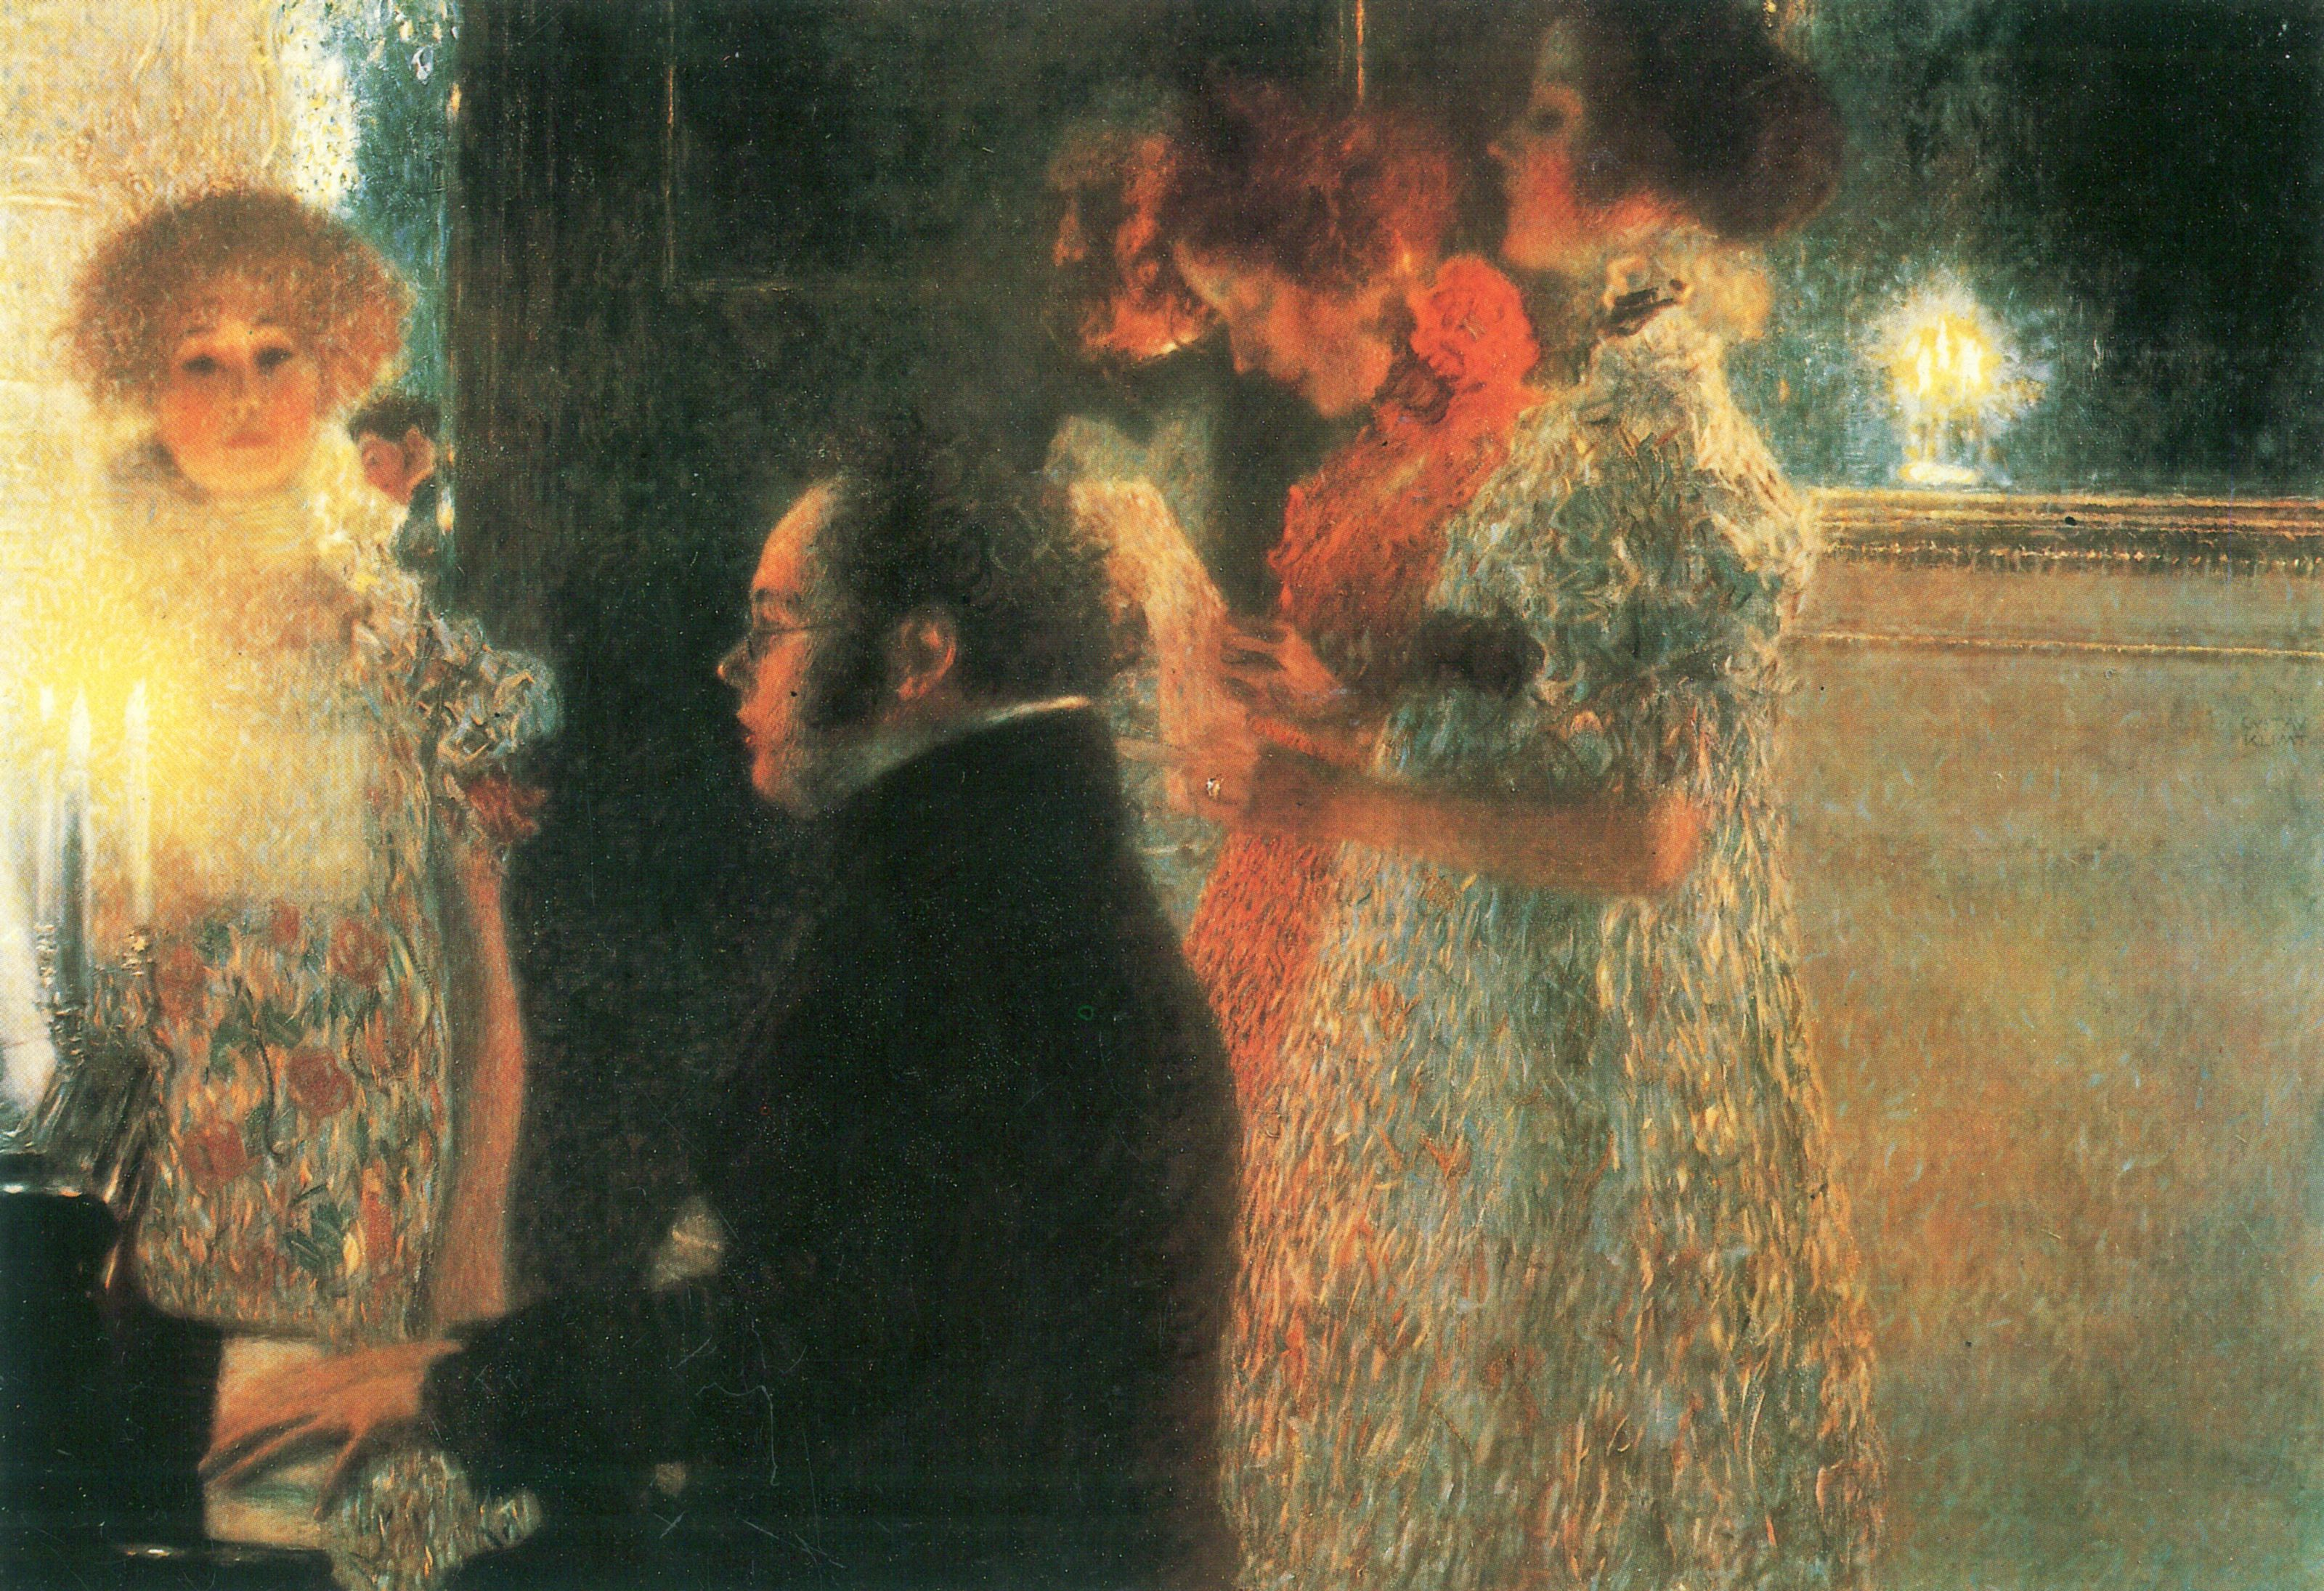 Gustv Klimt - Schubert at the Piano